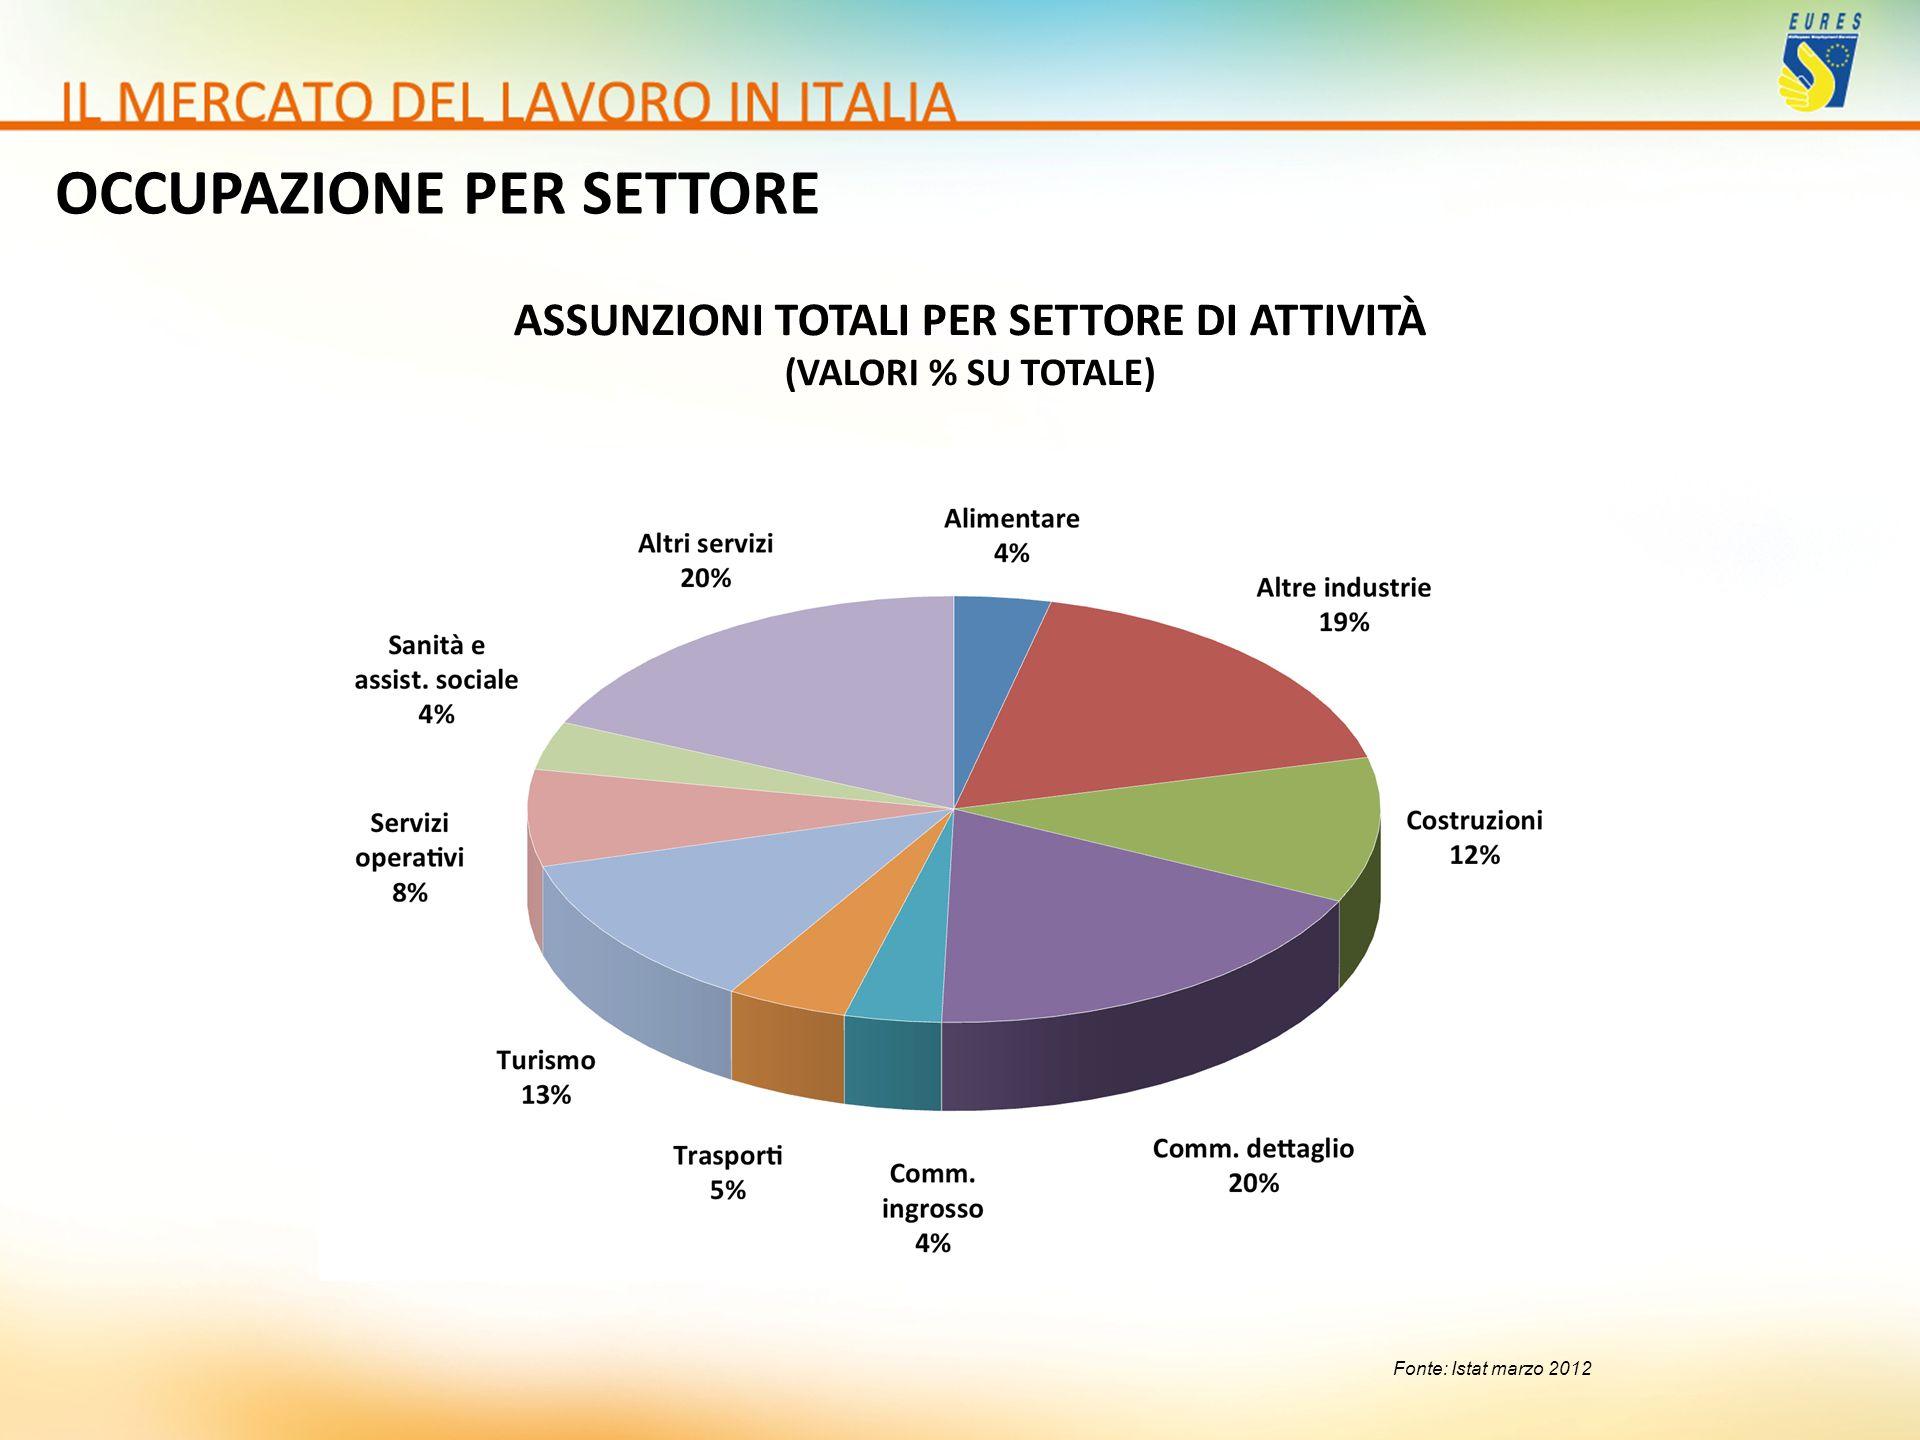 OCCUPAZIONE PER SETTORE ASSUNZIONI TOTALI PER SETTORE DI ATTIVITÀ (VALORI % SU TOTALE)